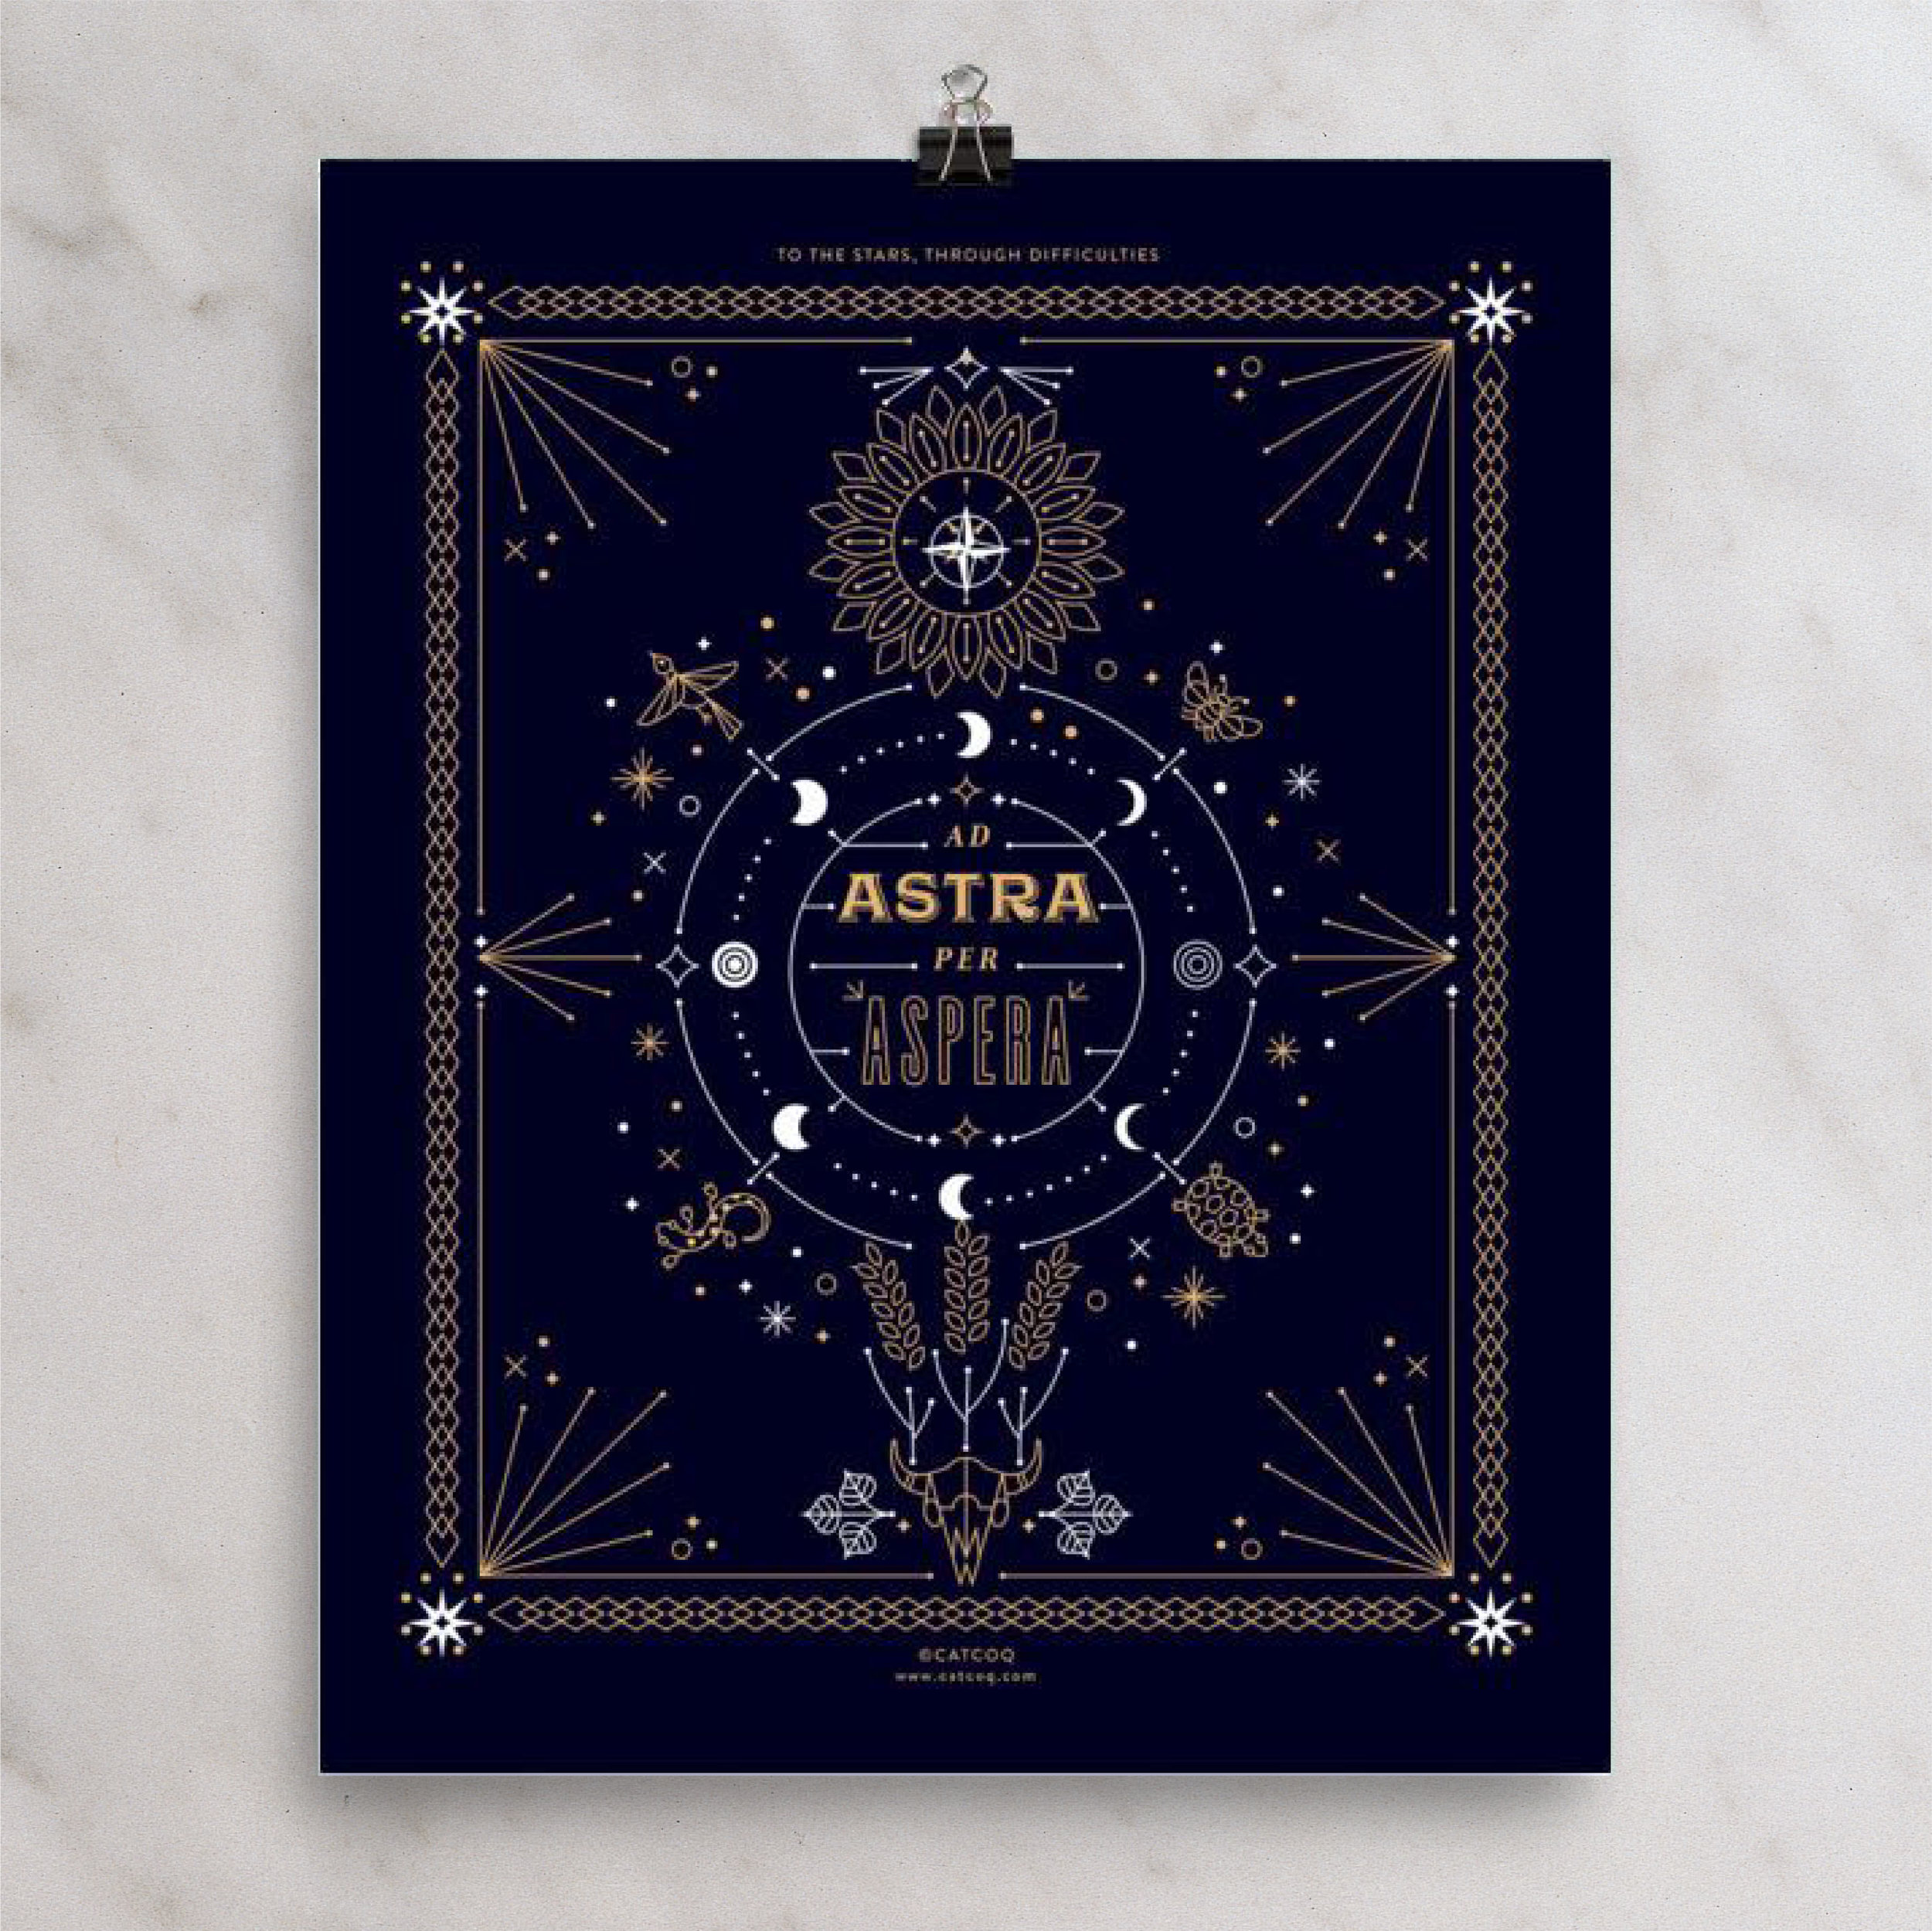 Ad Astra Per Aspera – Digital Art Print — CatCoq